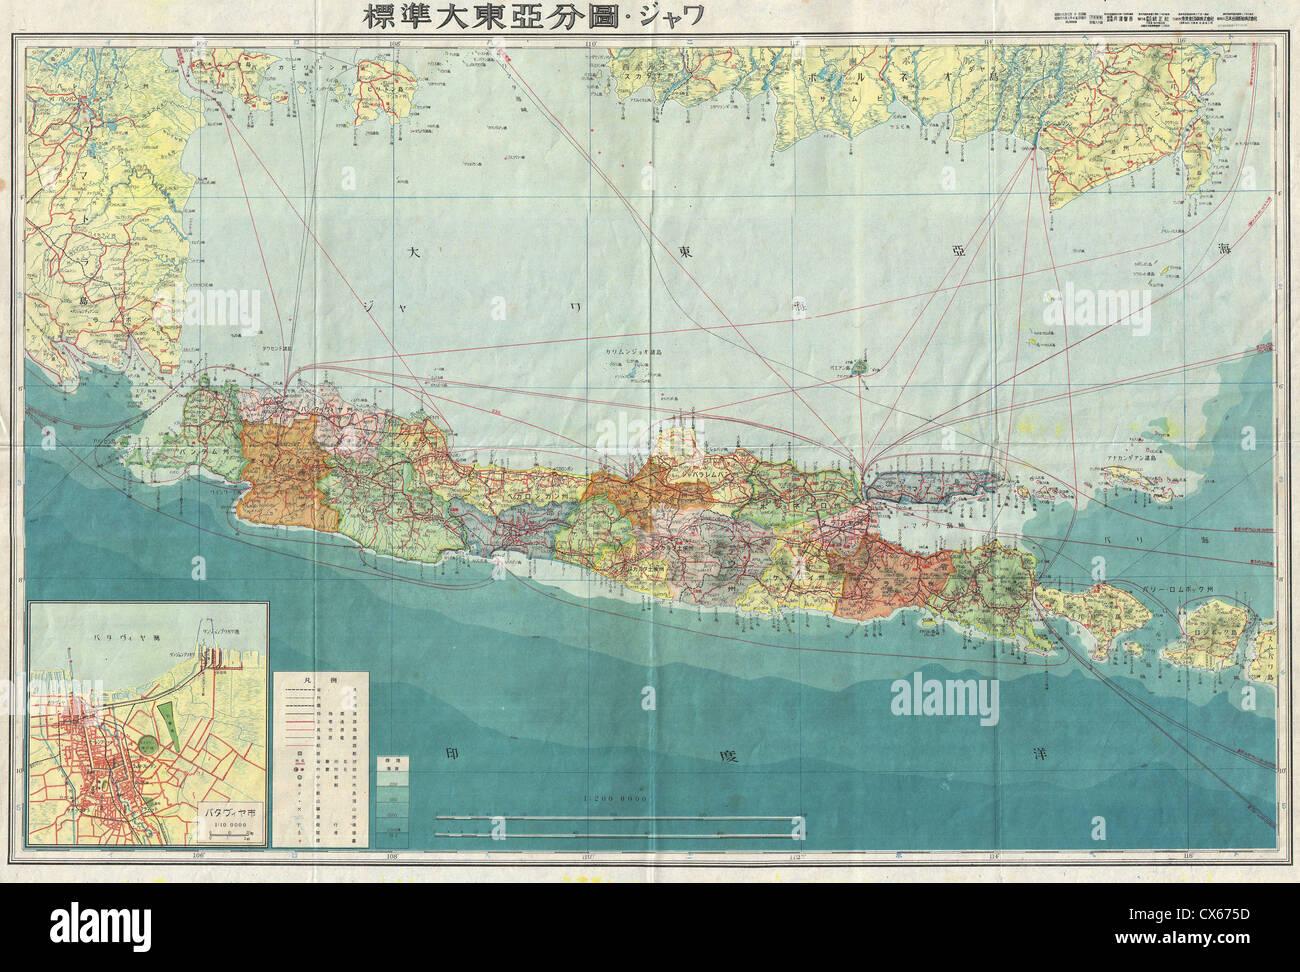 1943 world war ii japanese aeronautical map of java stock photo 1943 world war ii japanese aeronautical map of java gumiabroncs Choice Image